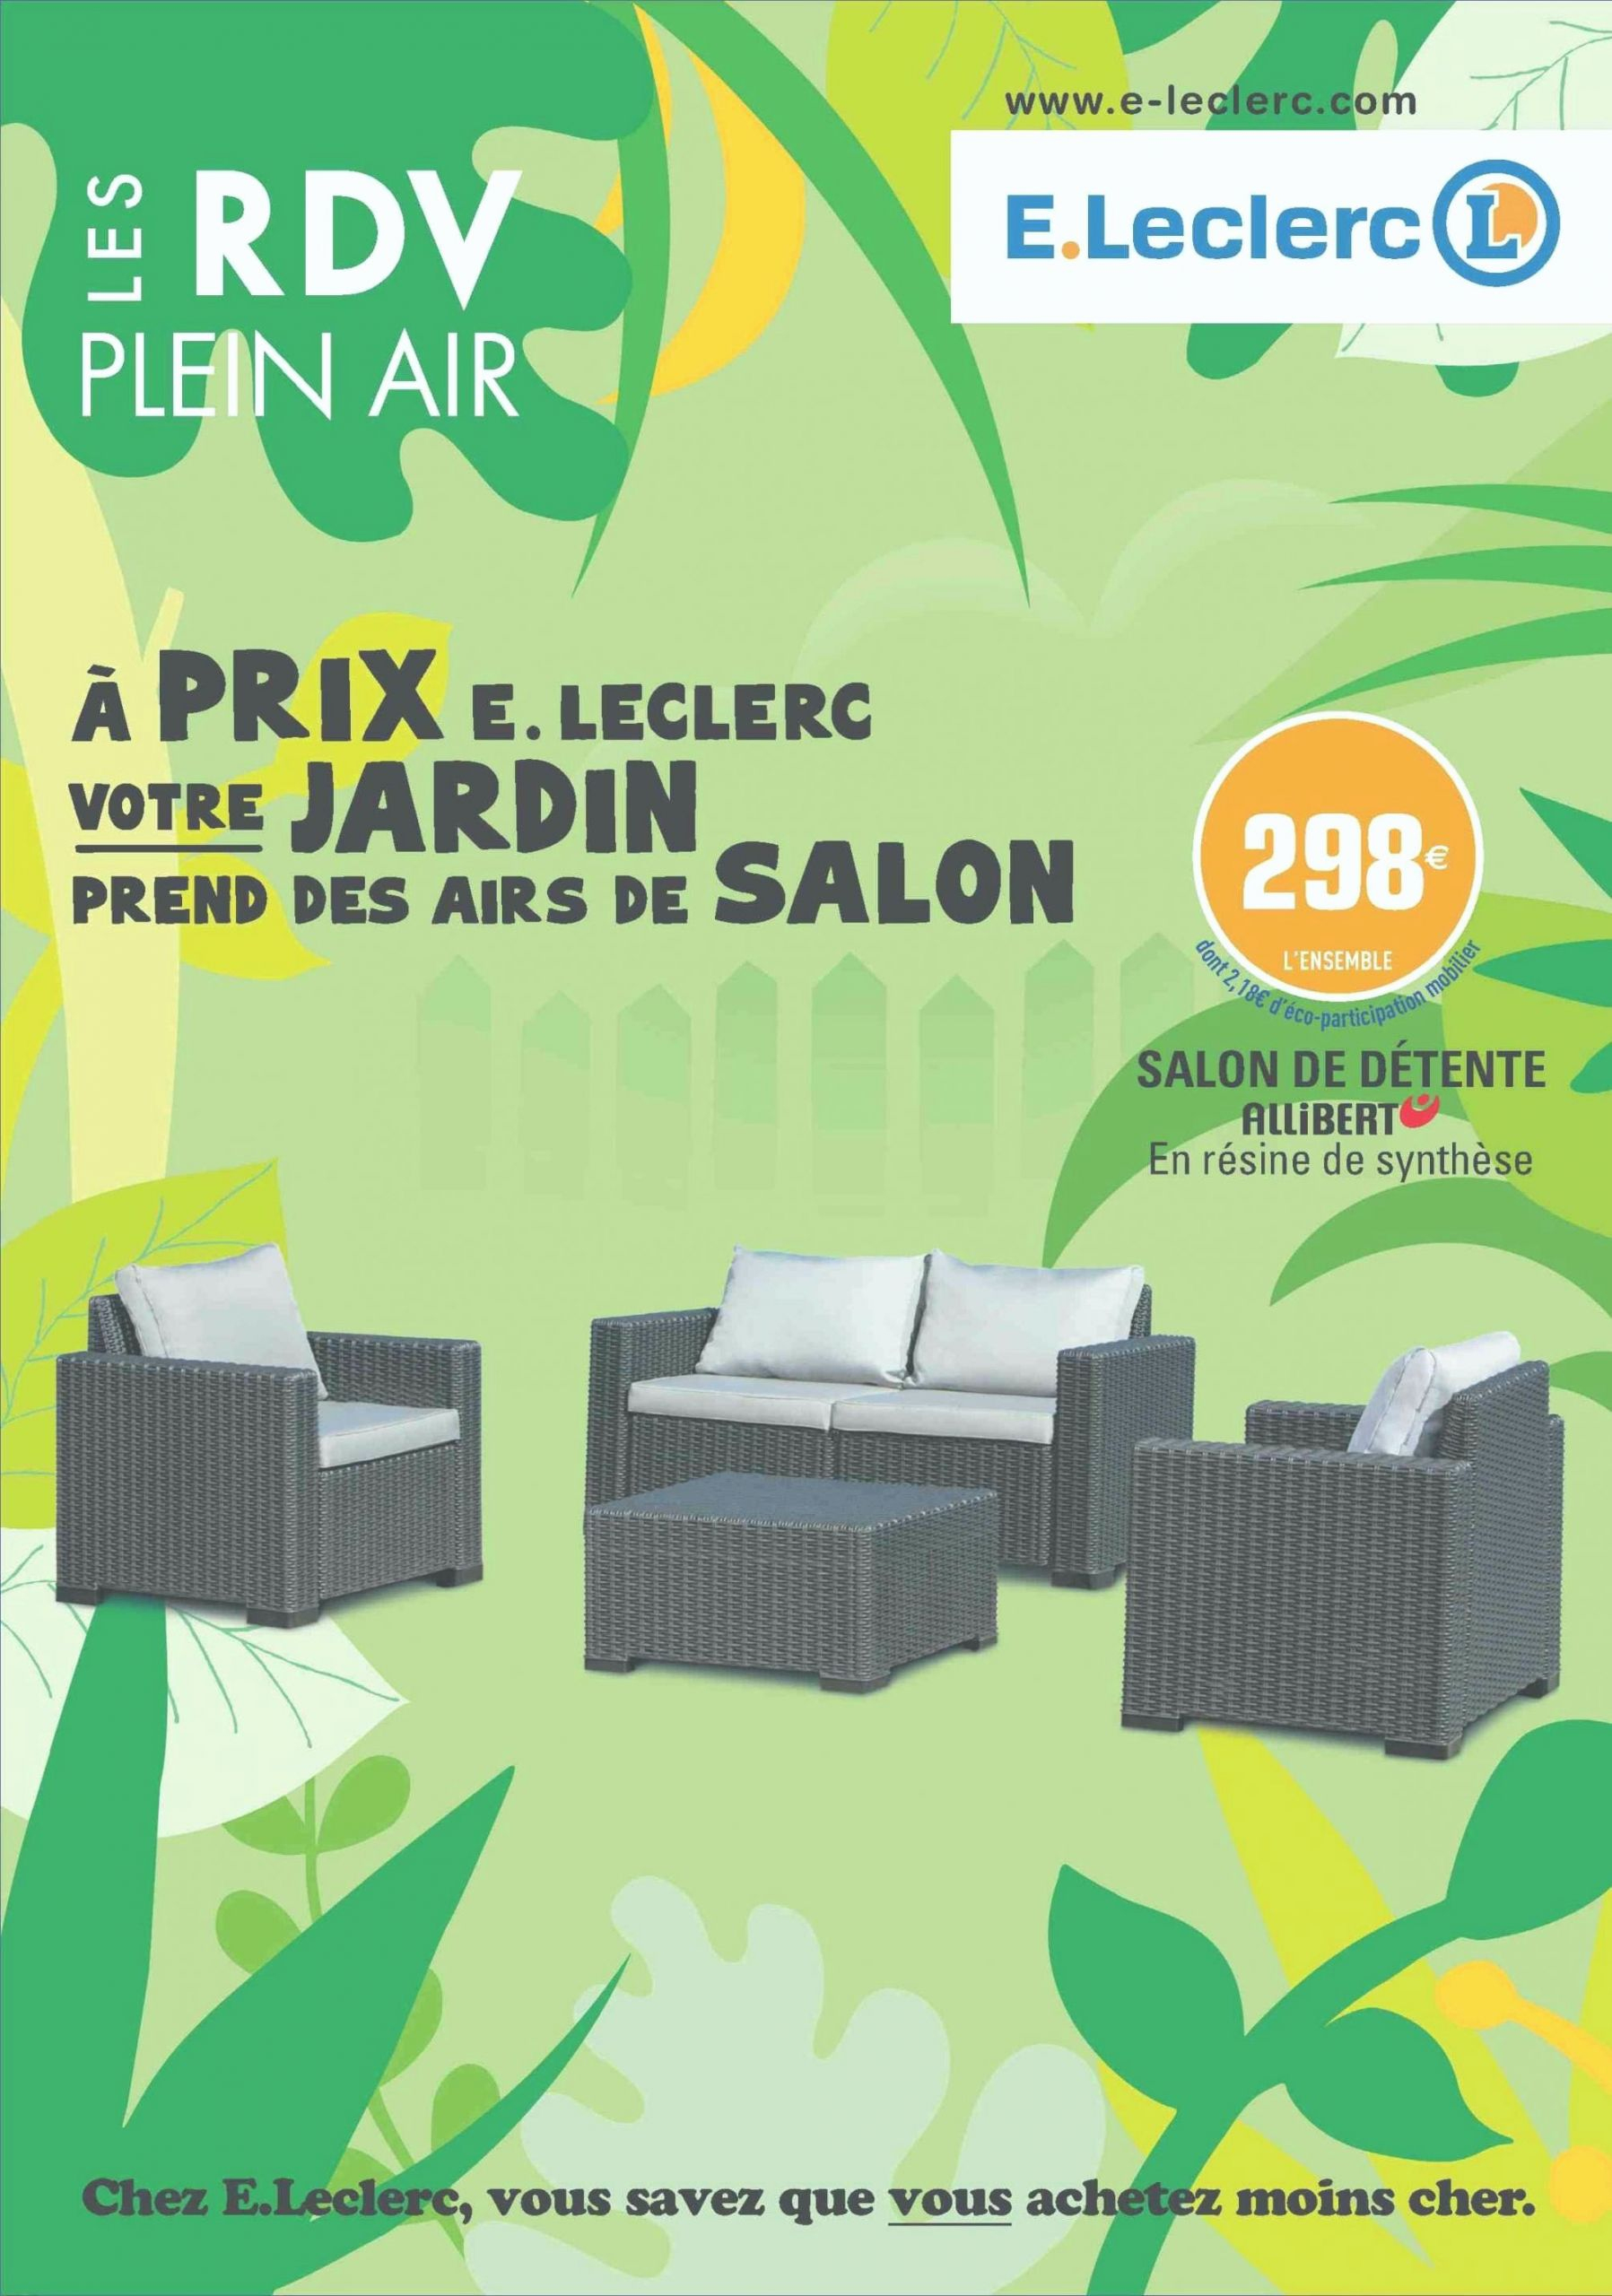 Table De Salon De Jardin Leclerc Inspirant Meuble Salle De ... serapportantà Transat Jardin Chez Leclerc